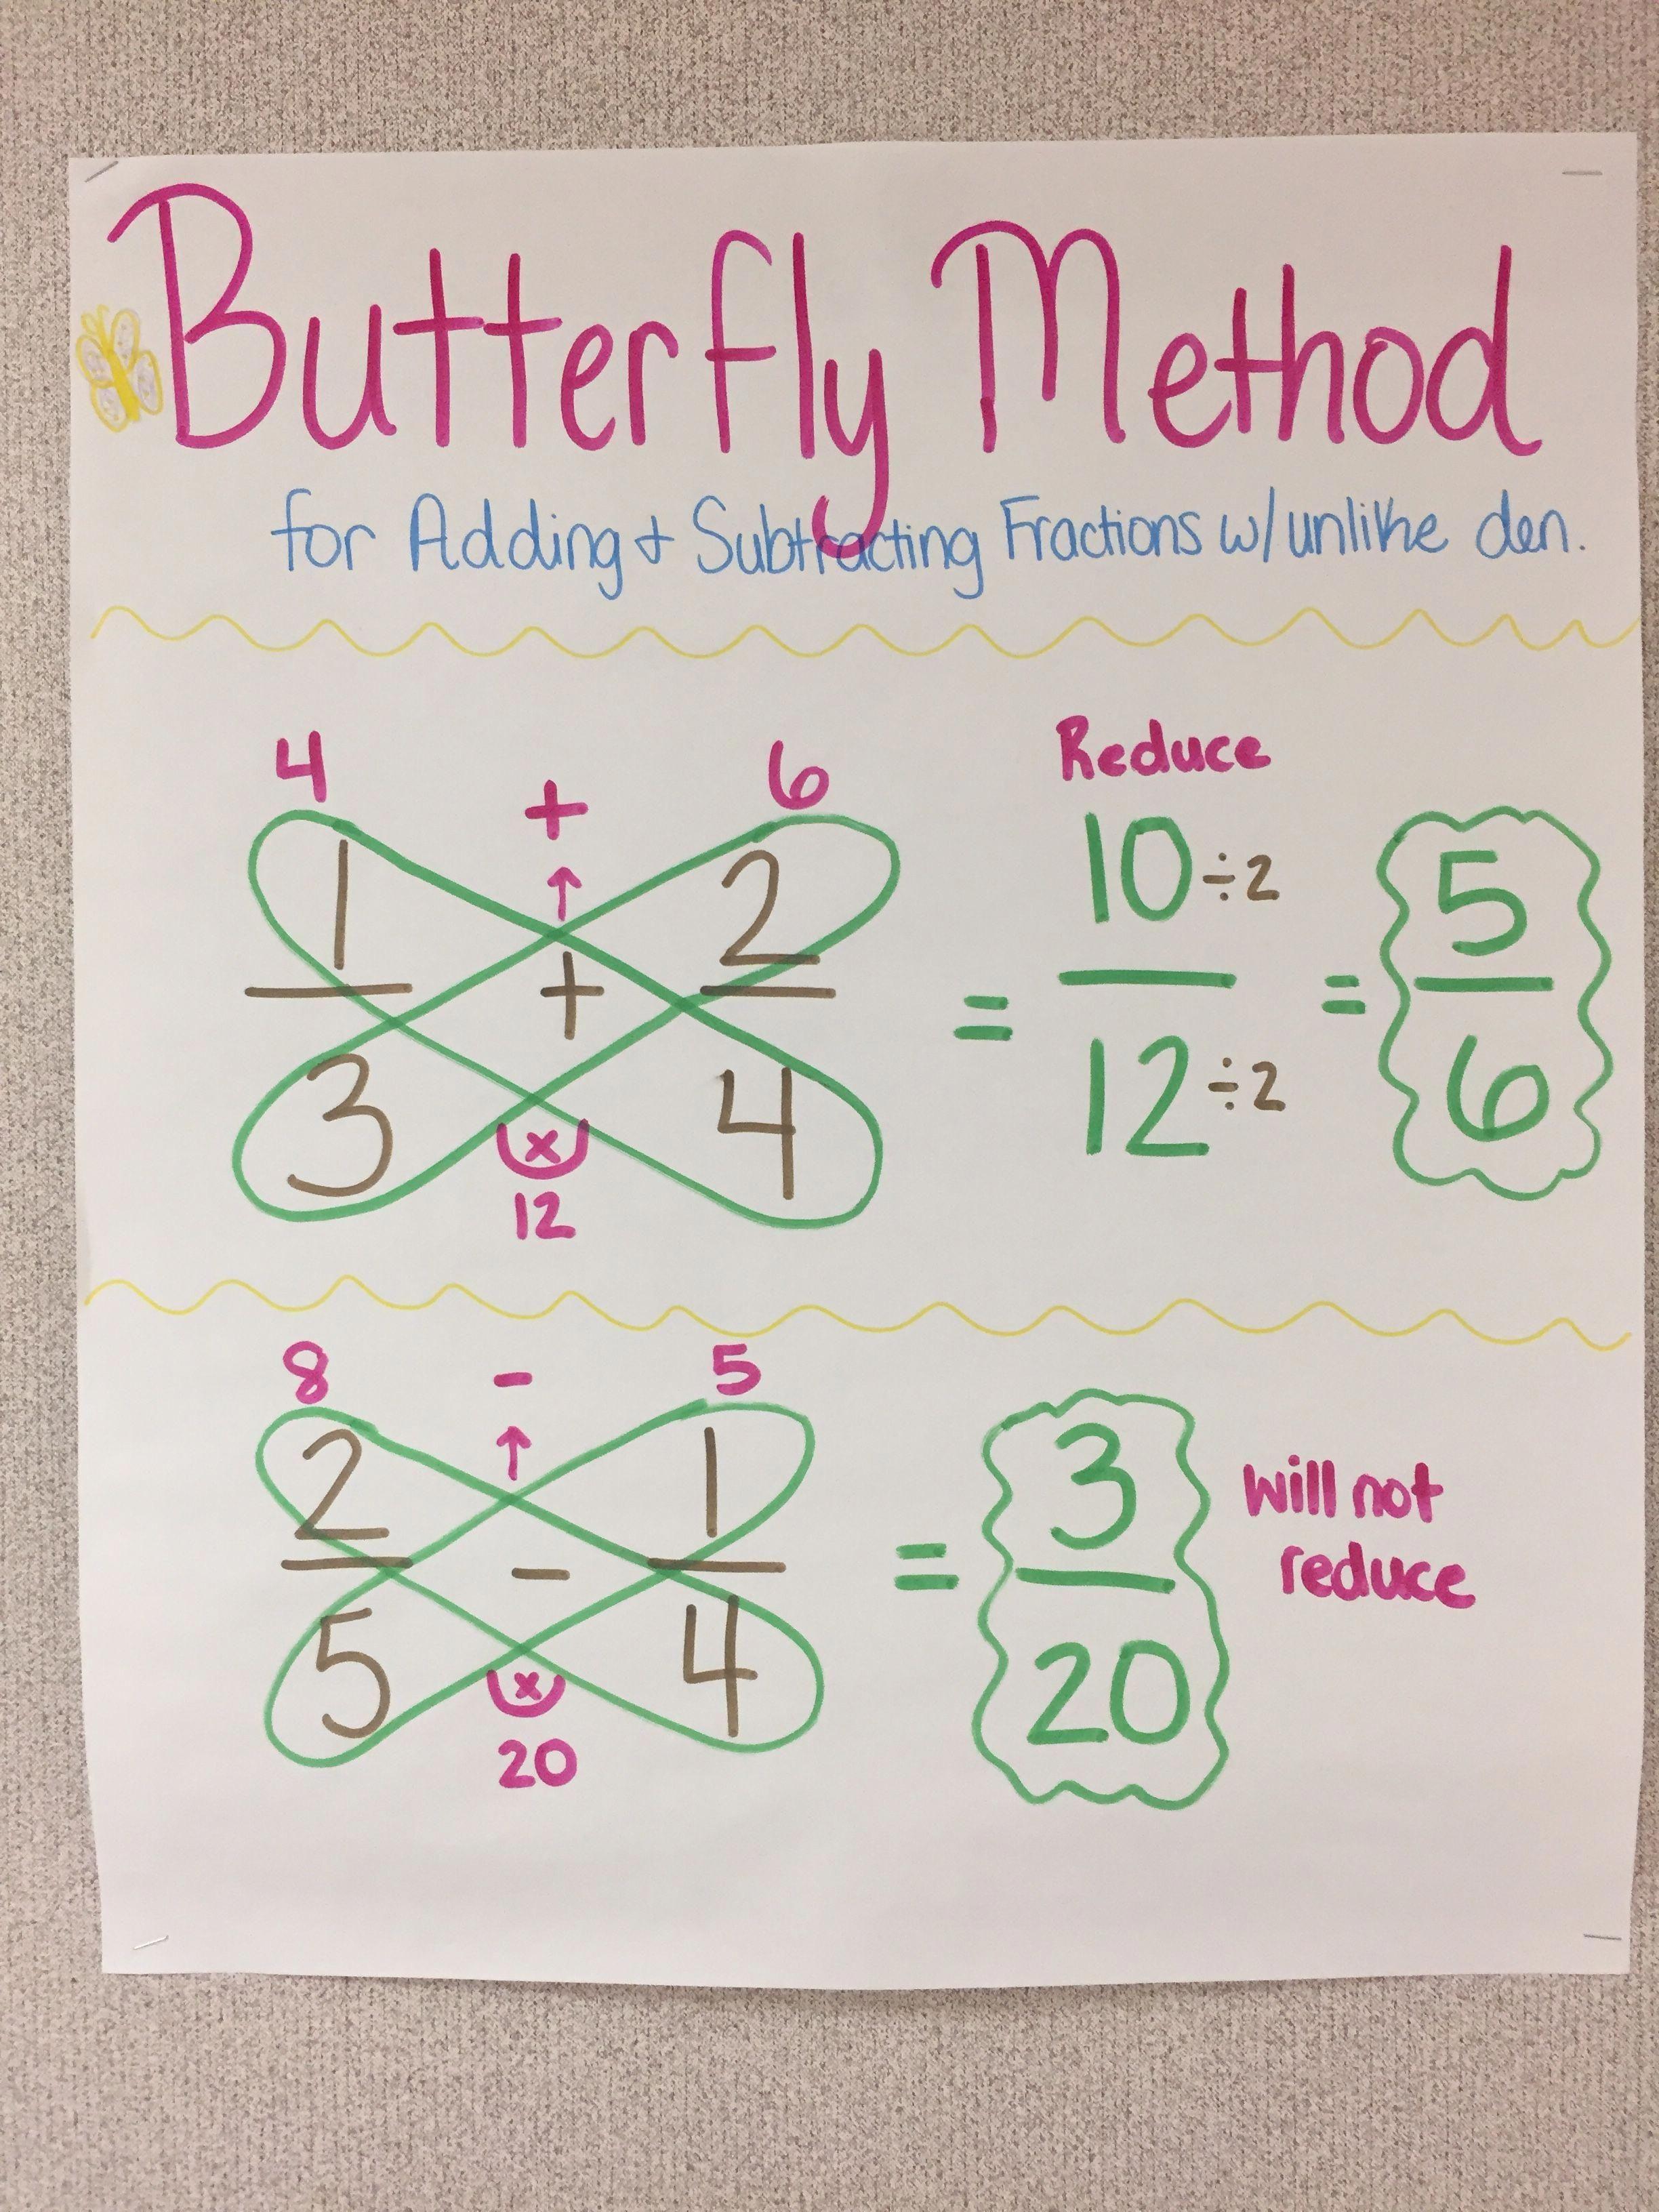 Pin By Mel Riker On School In 2020 Math Methods Big Ideas Math Studying Math